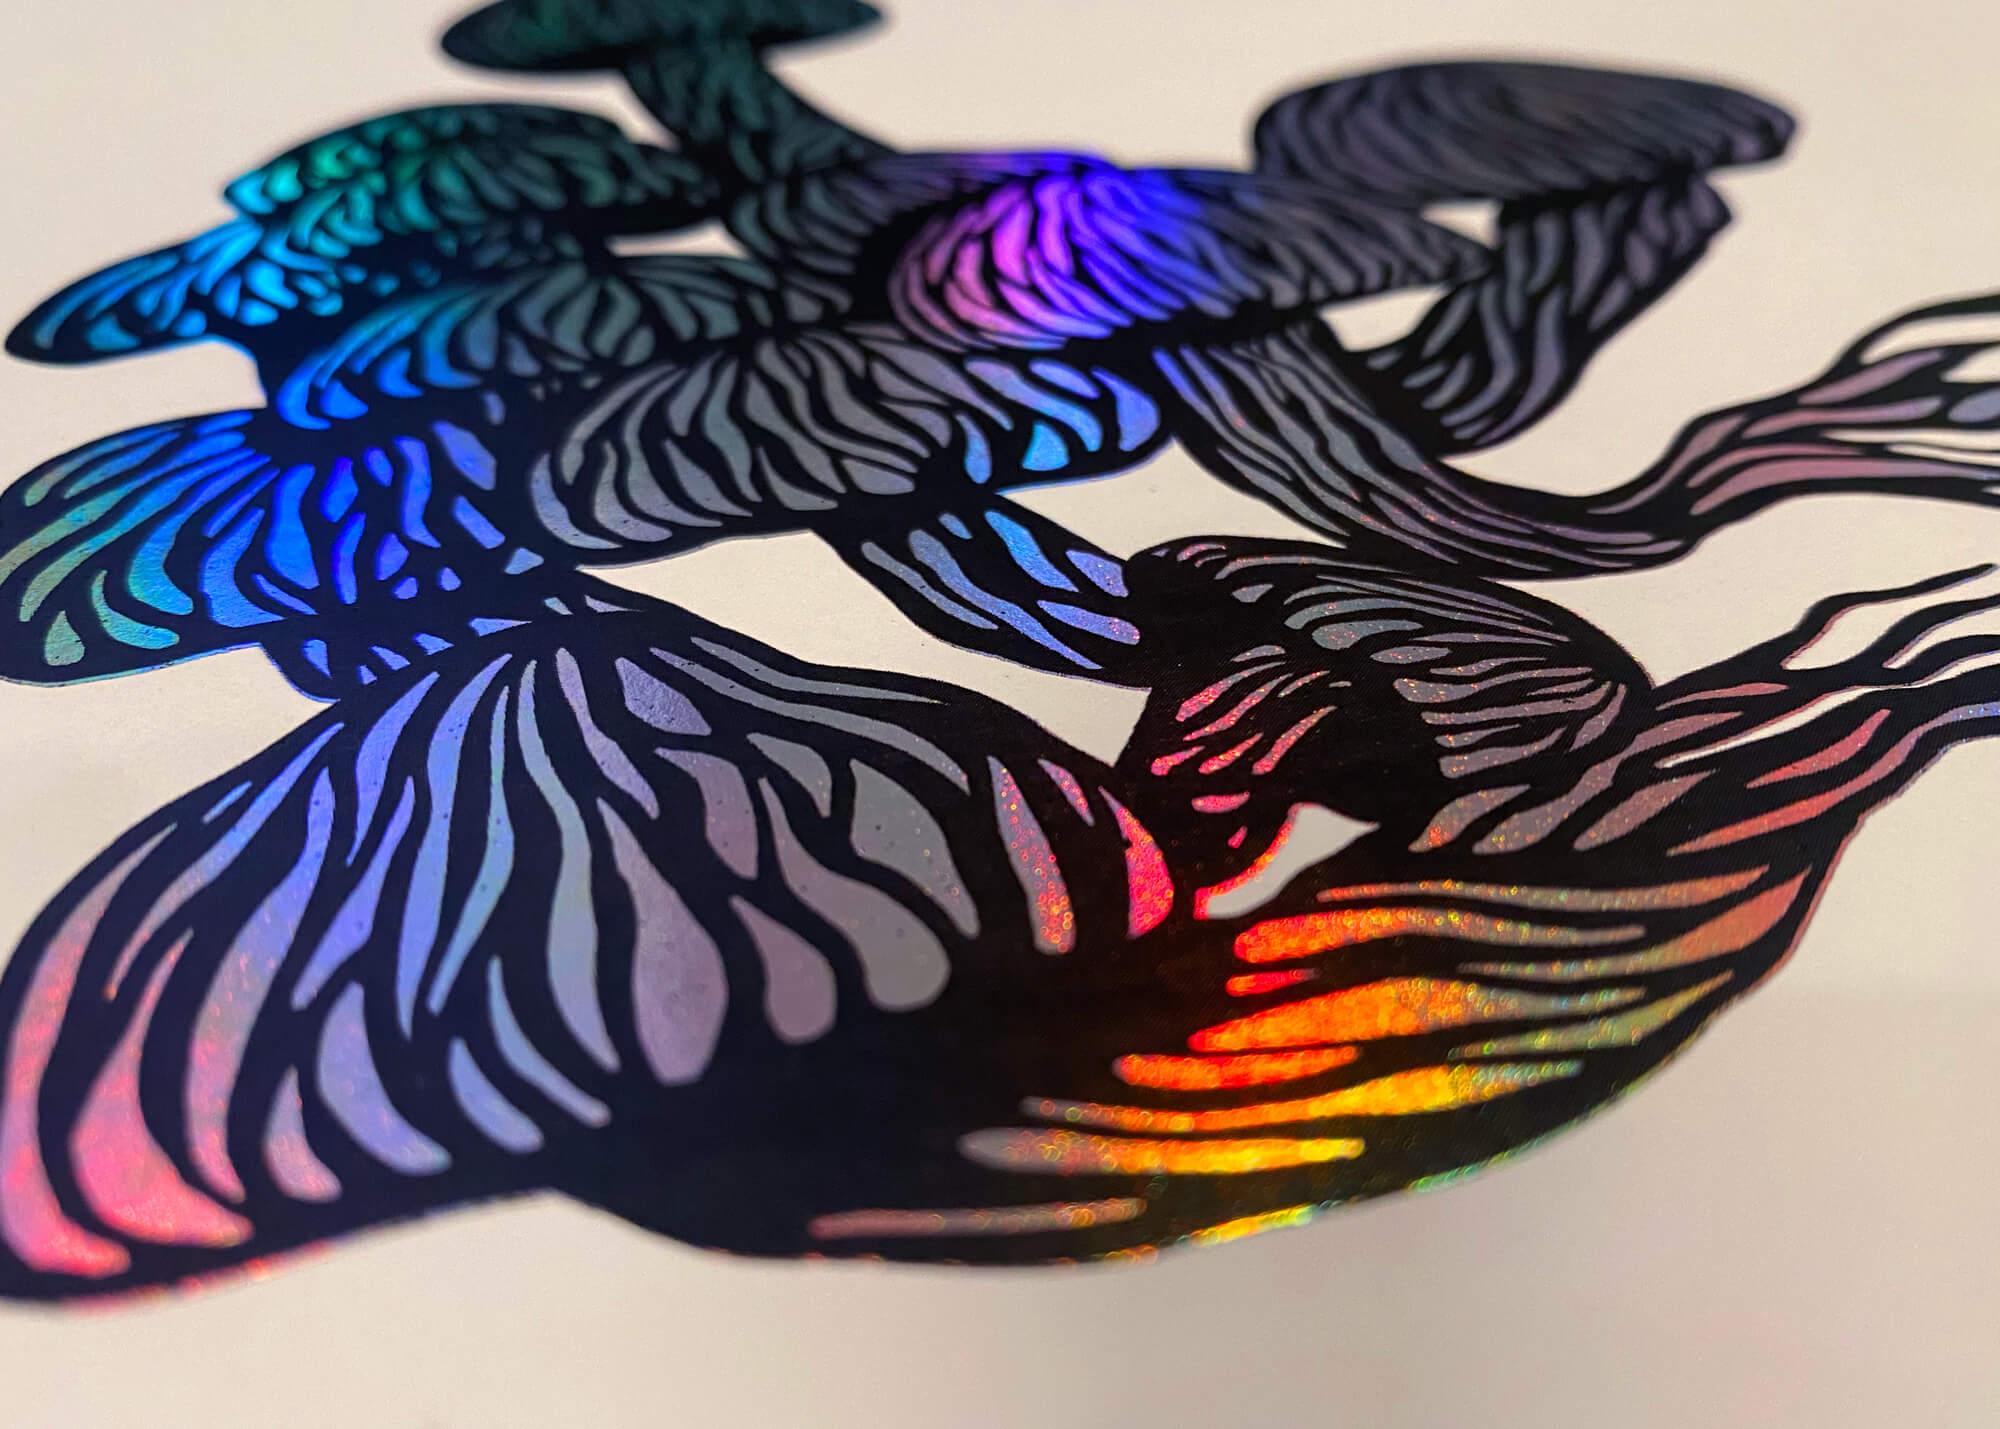 Mushroom foil print